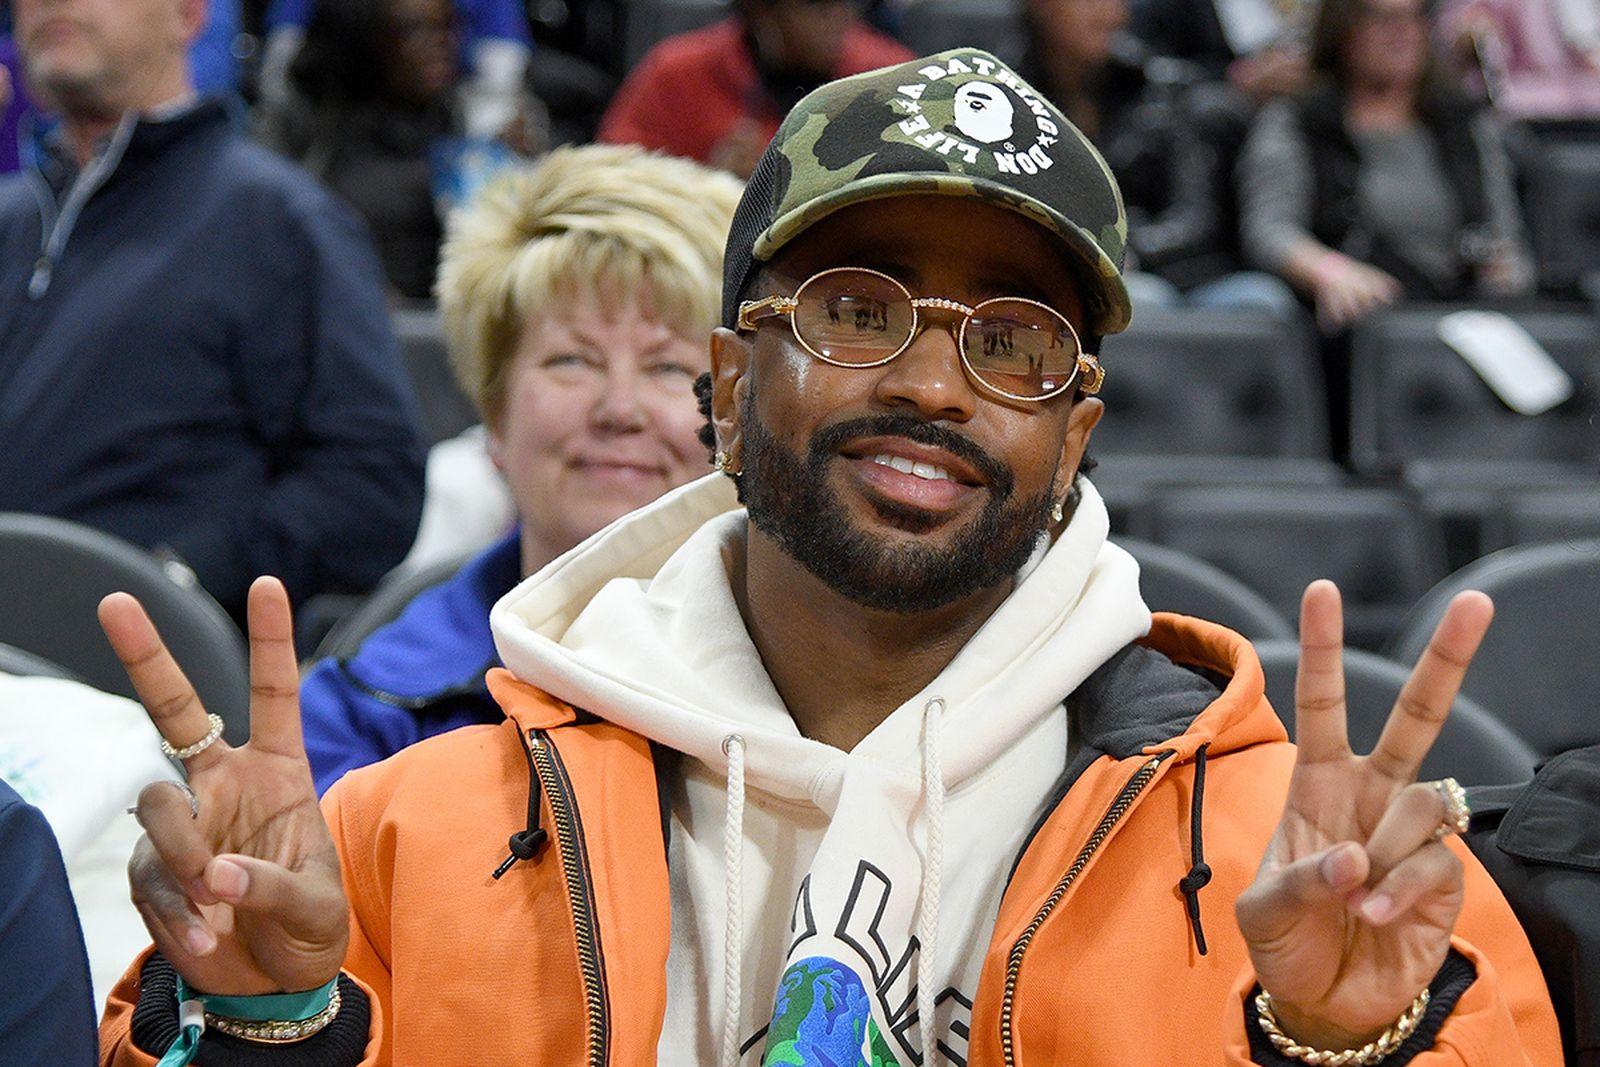 Big Sean BAPE hat glasses